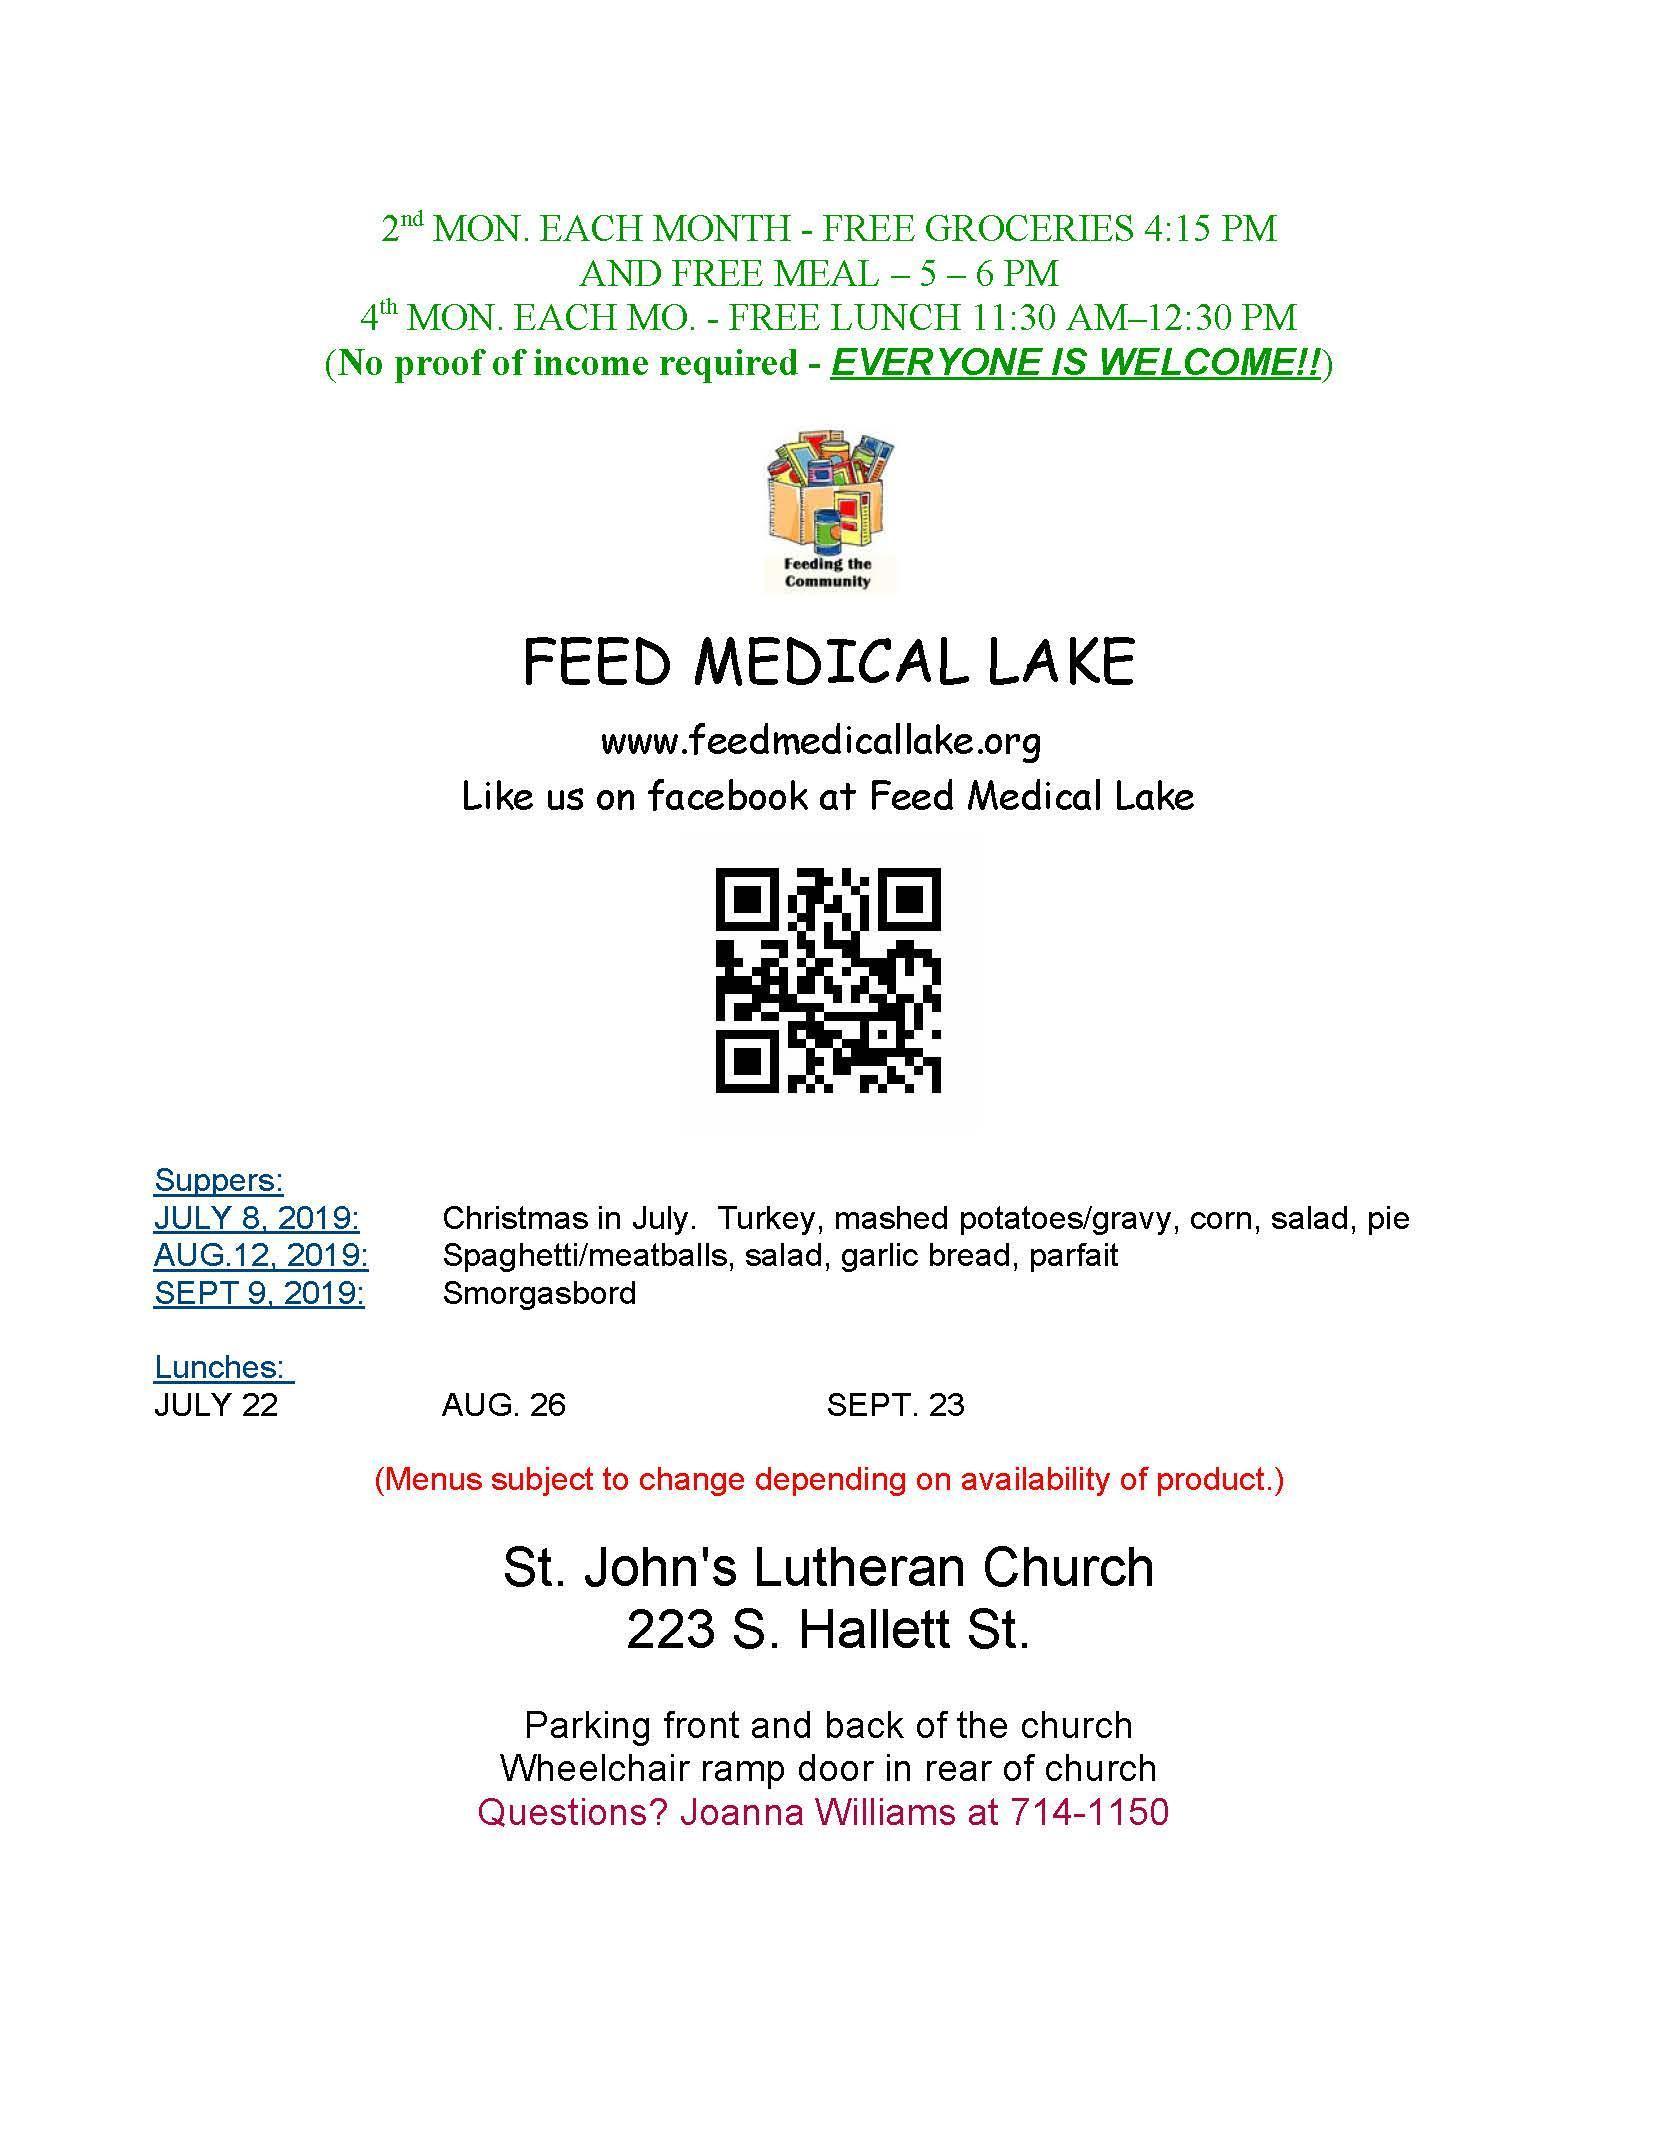 Feed Medical Lake Summer Program